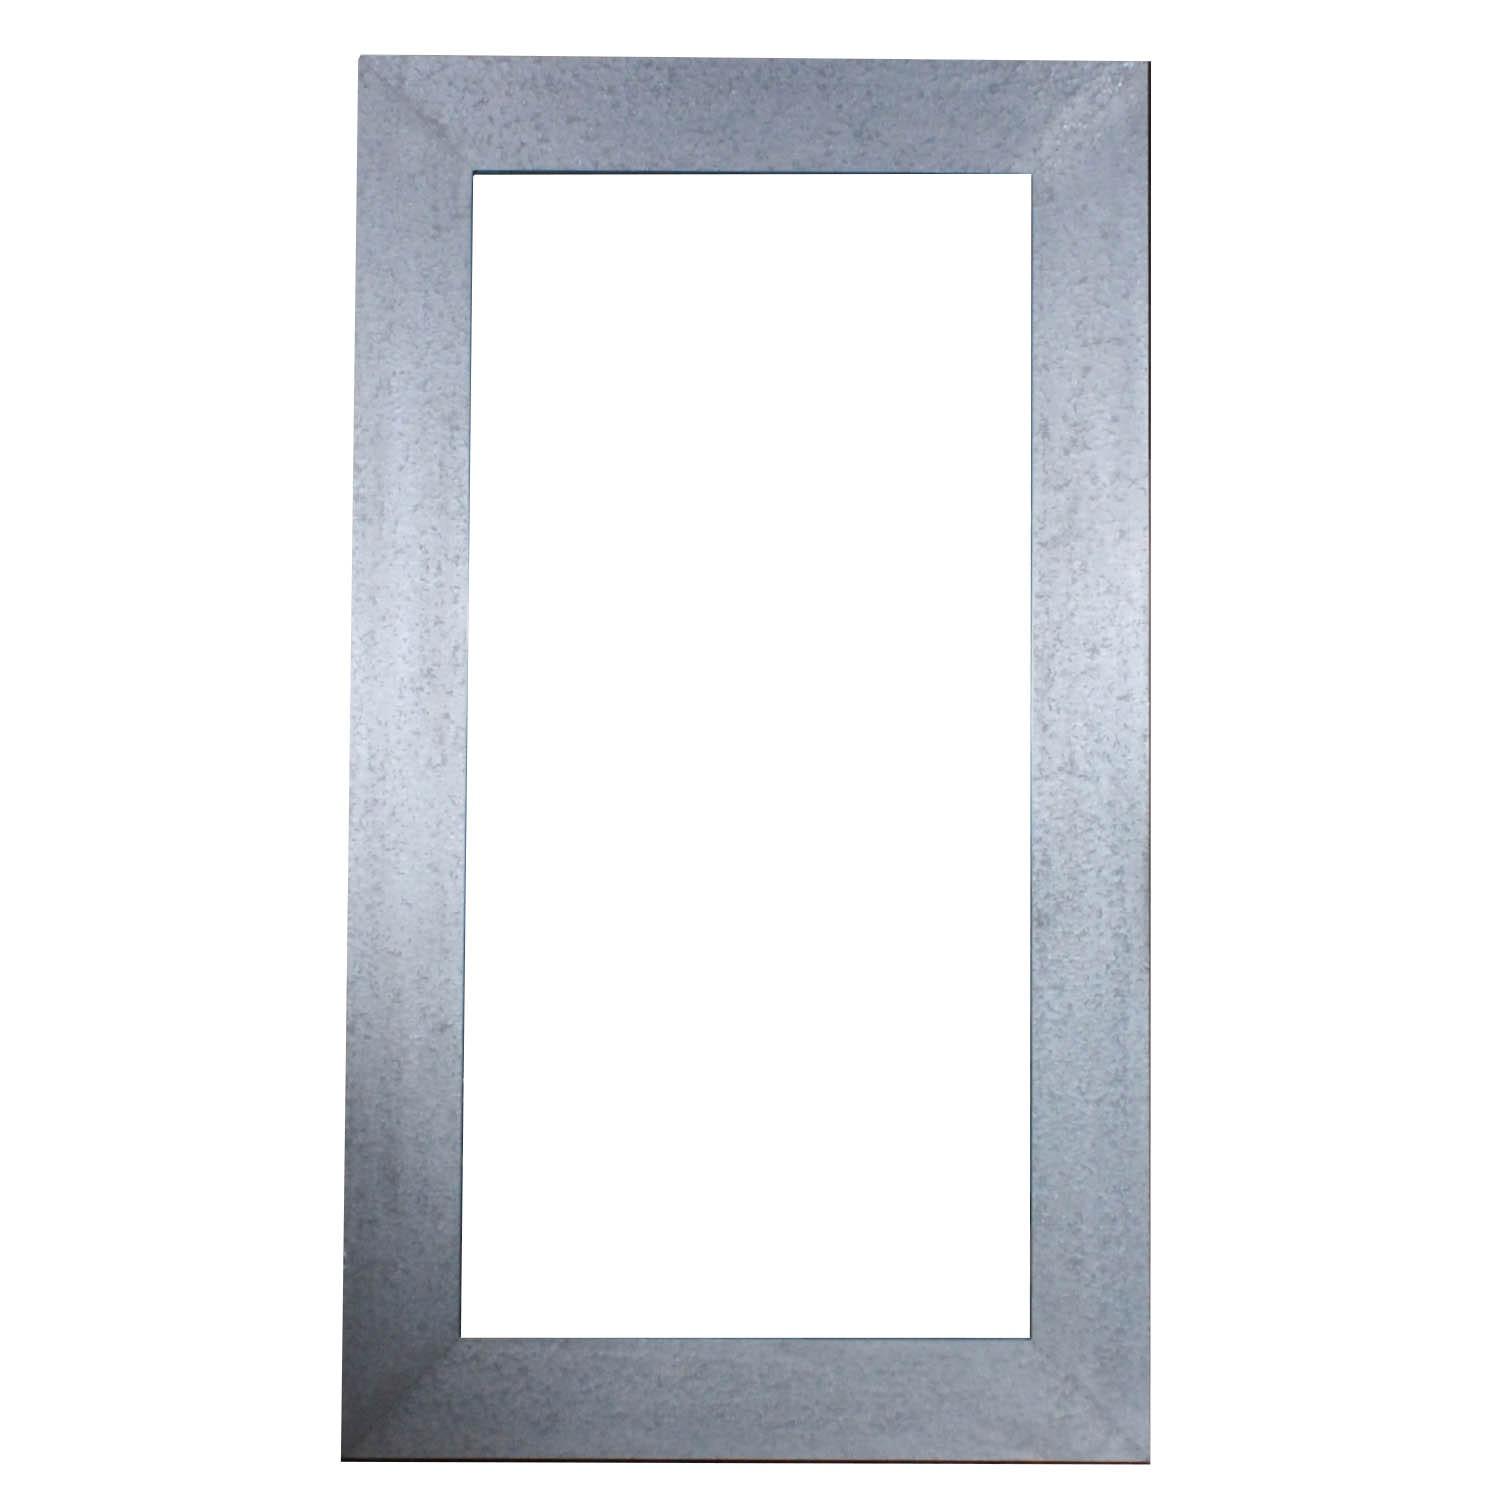 Industrial Chic Oversize Galvanized Wall Mirror